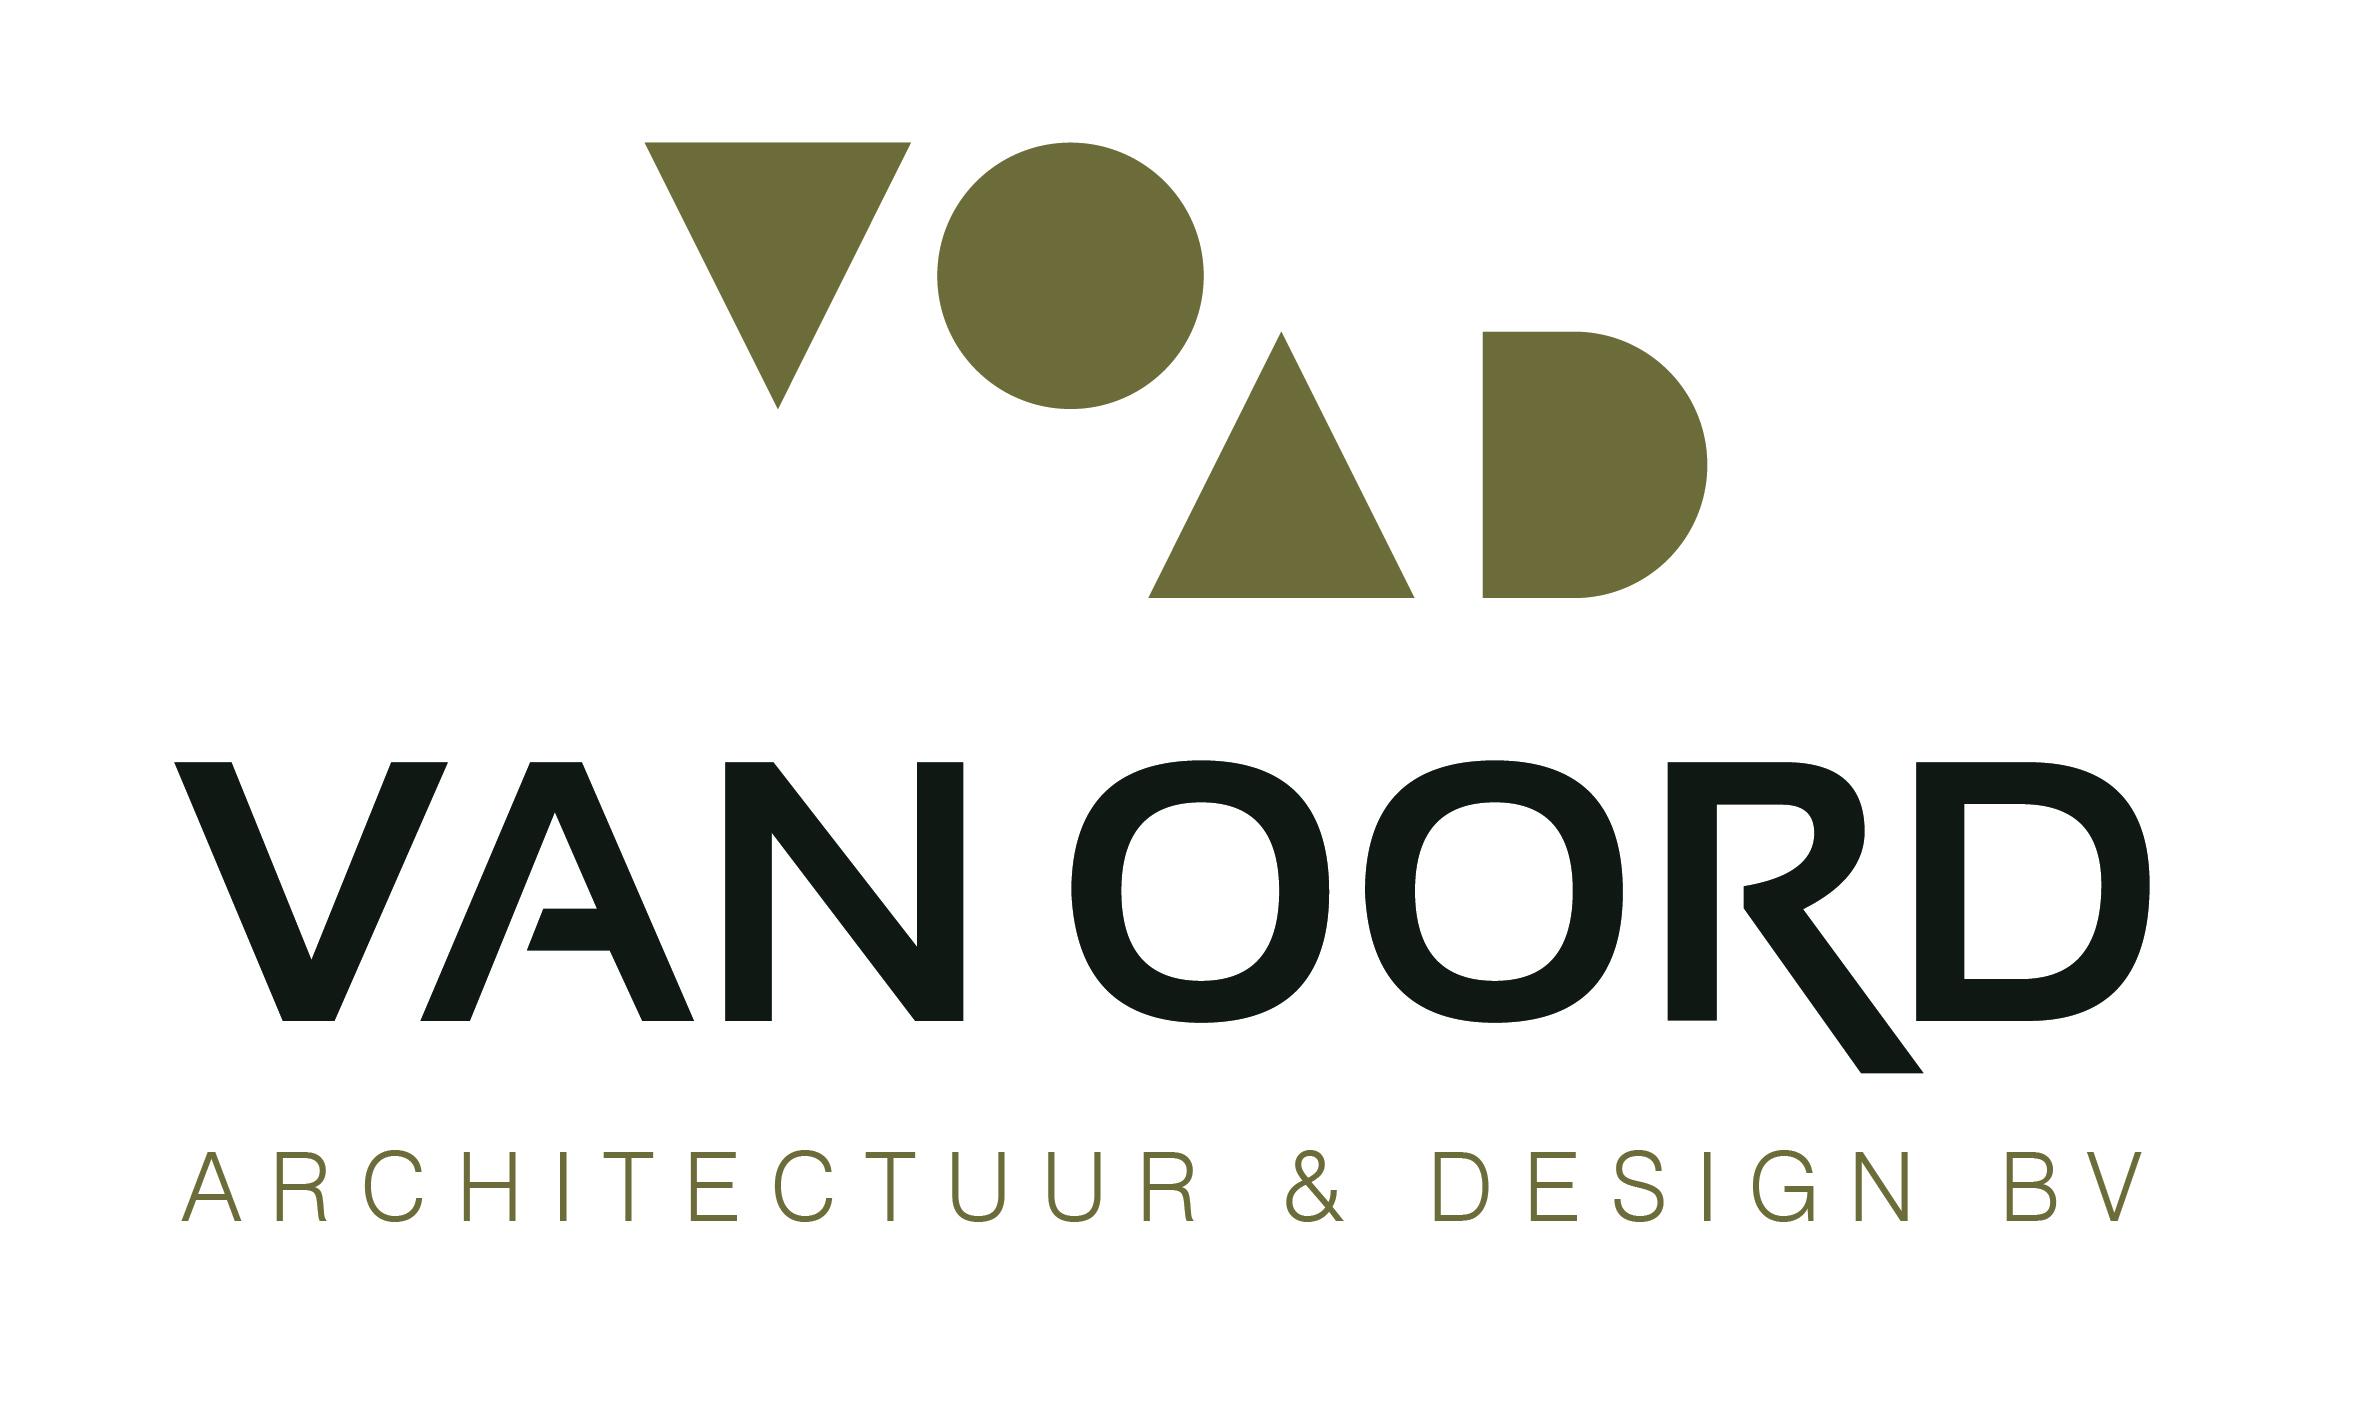 Van Oord Architectuur & Design B.V. architect apeldoorn